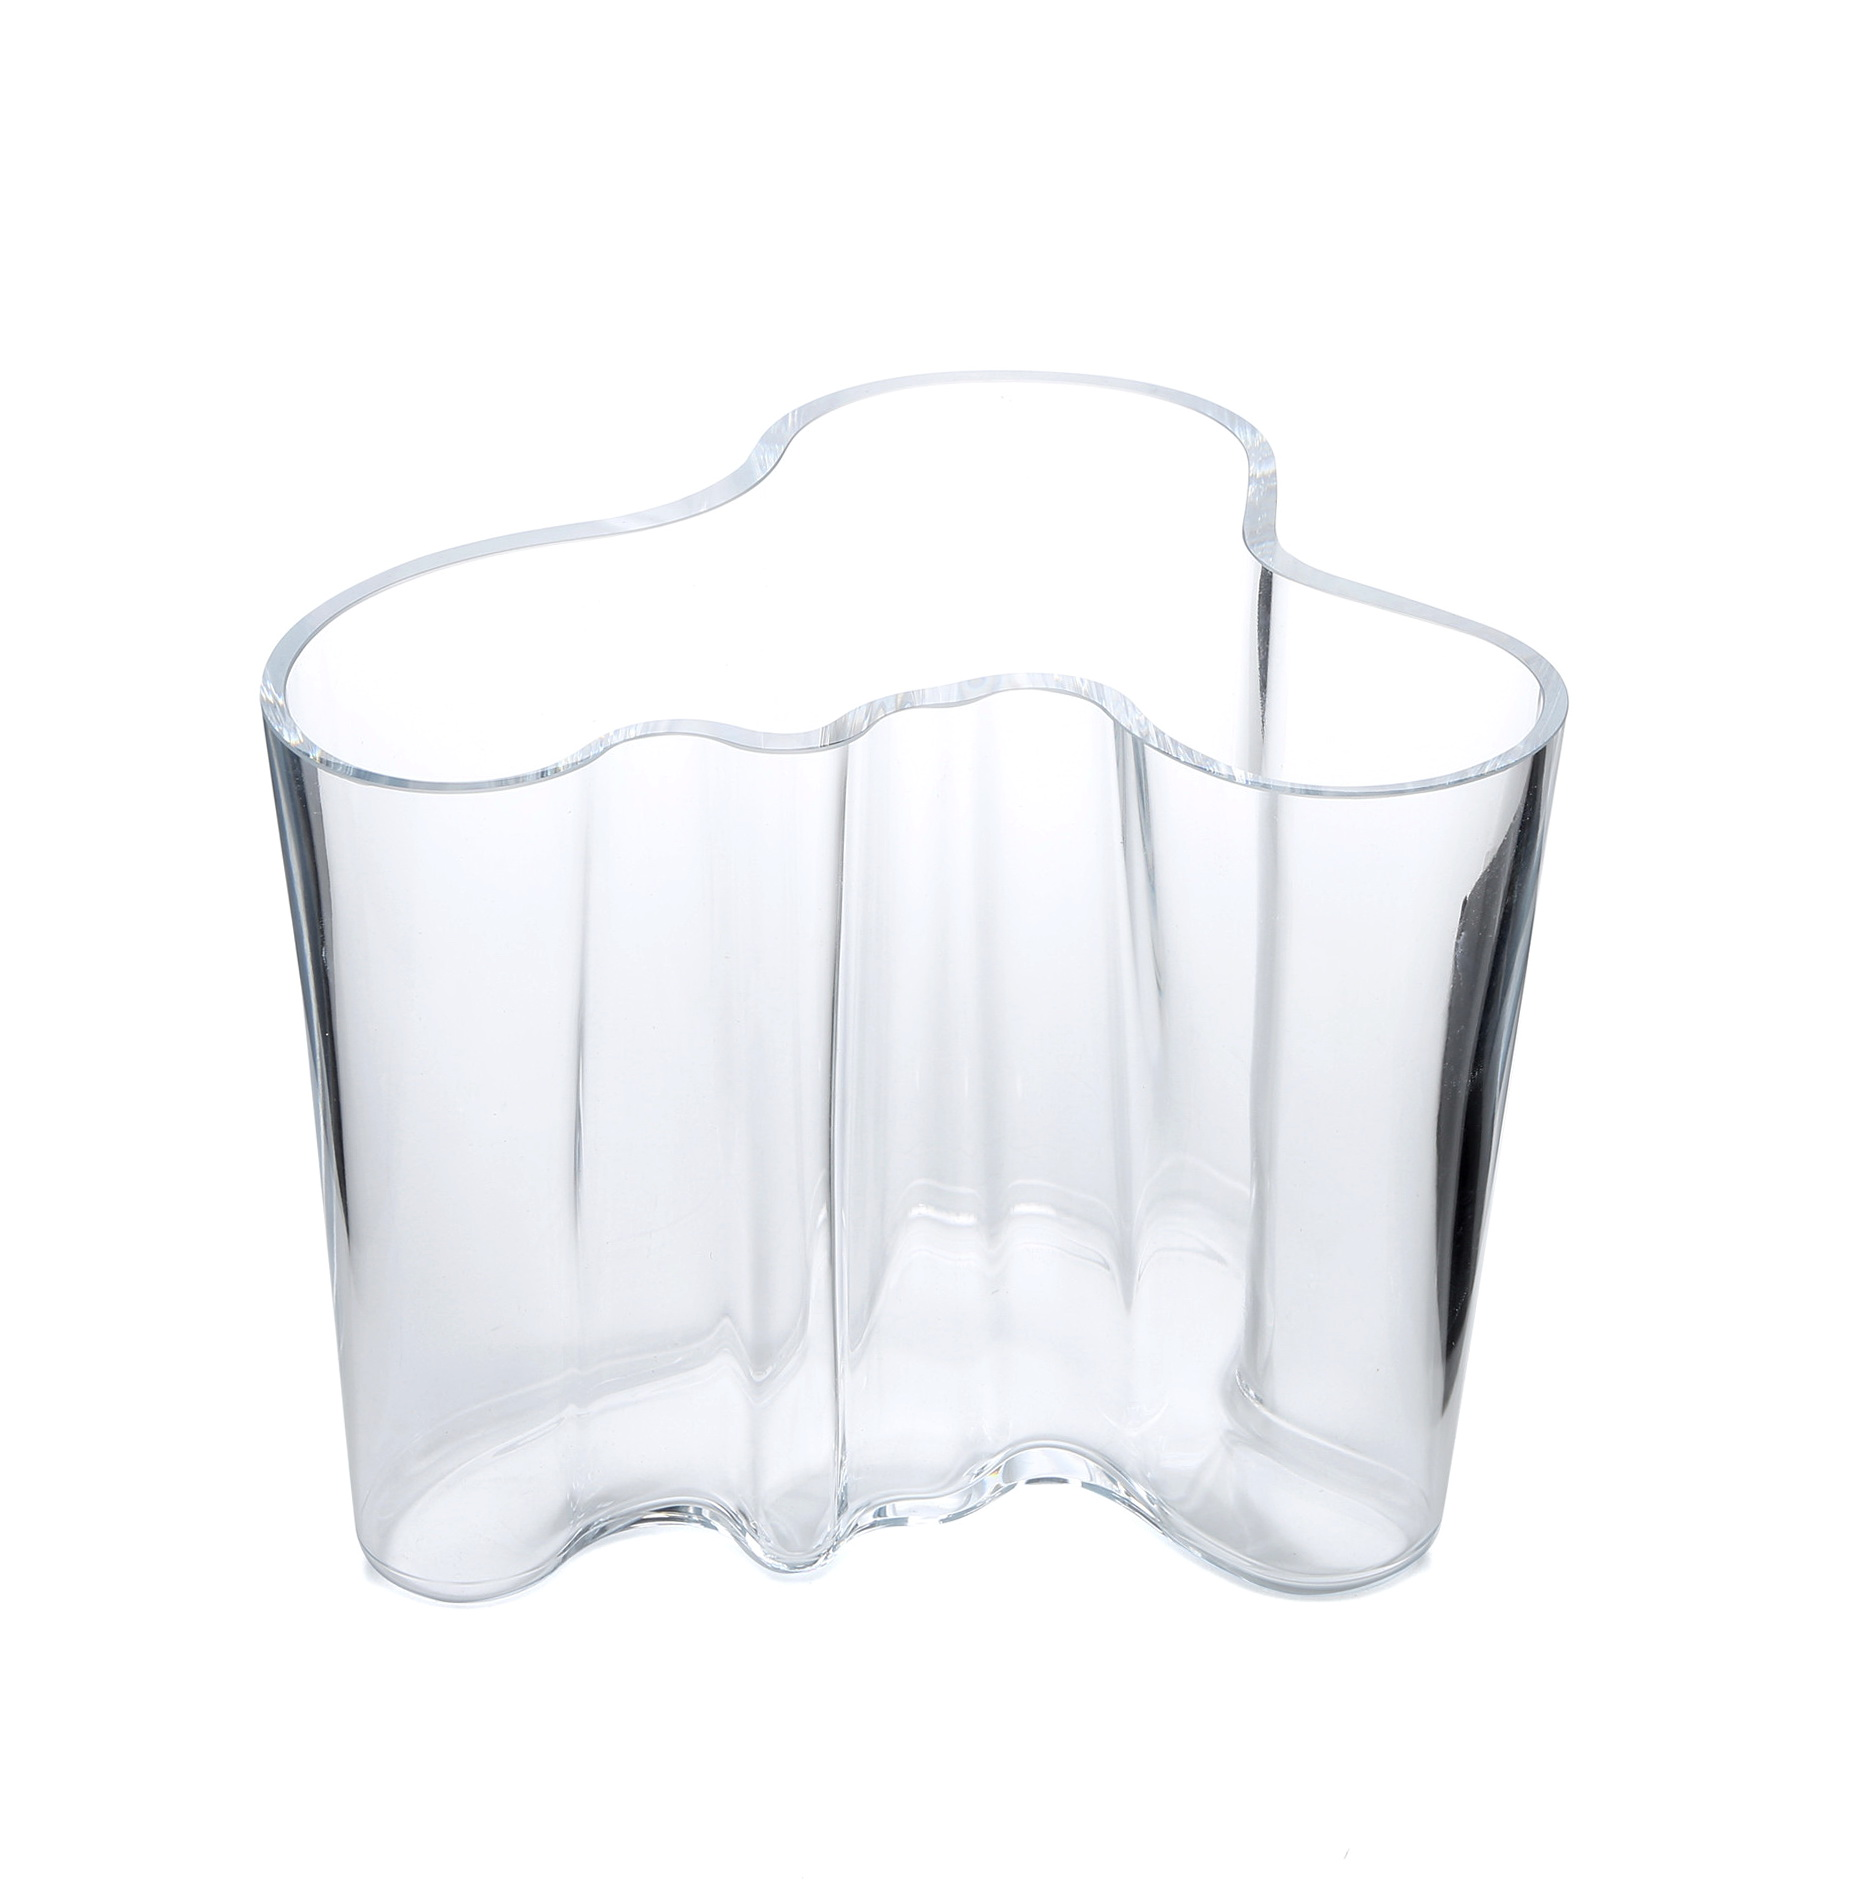 Alvar Aalto Vase Moma